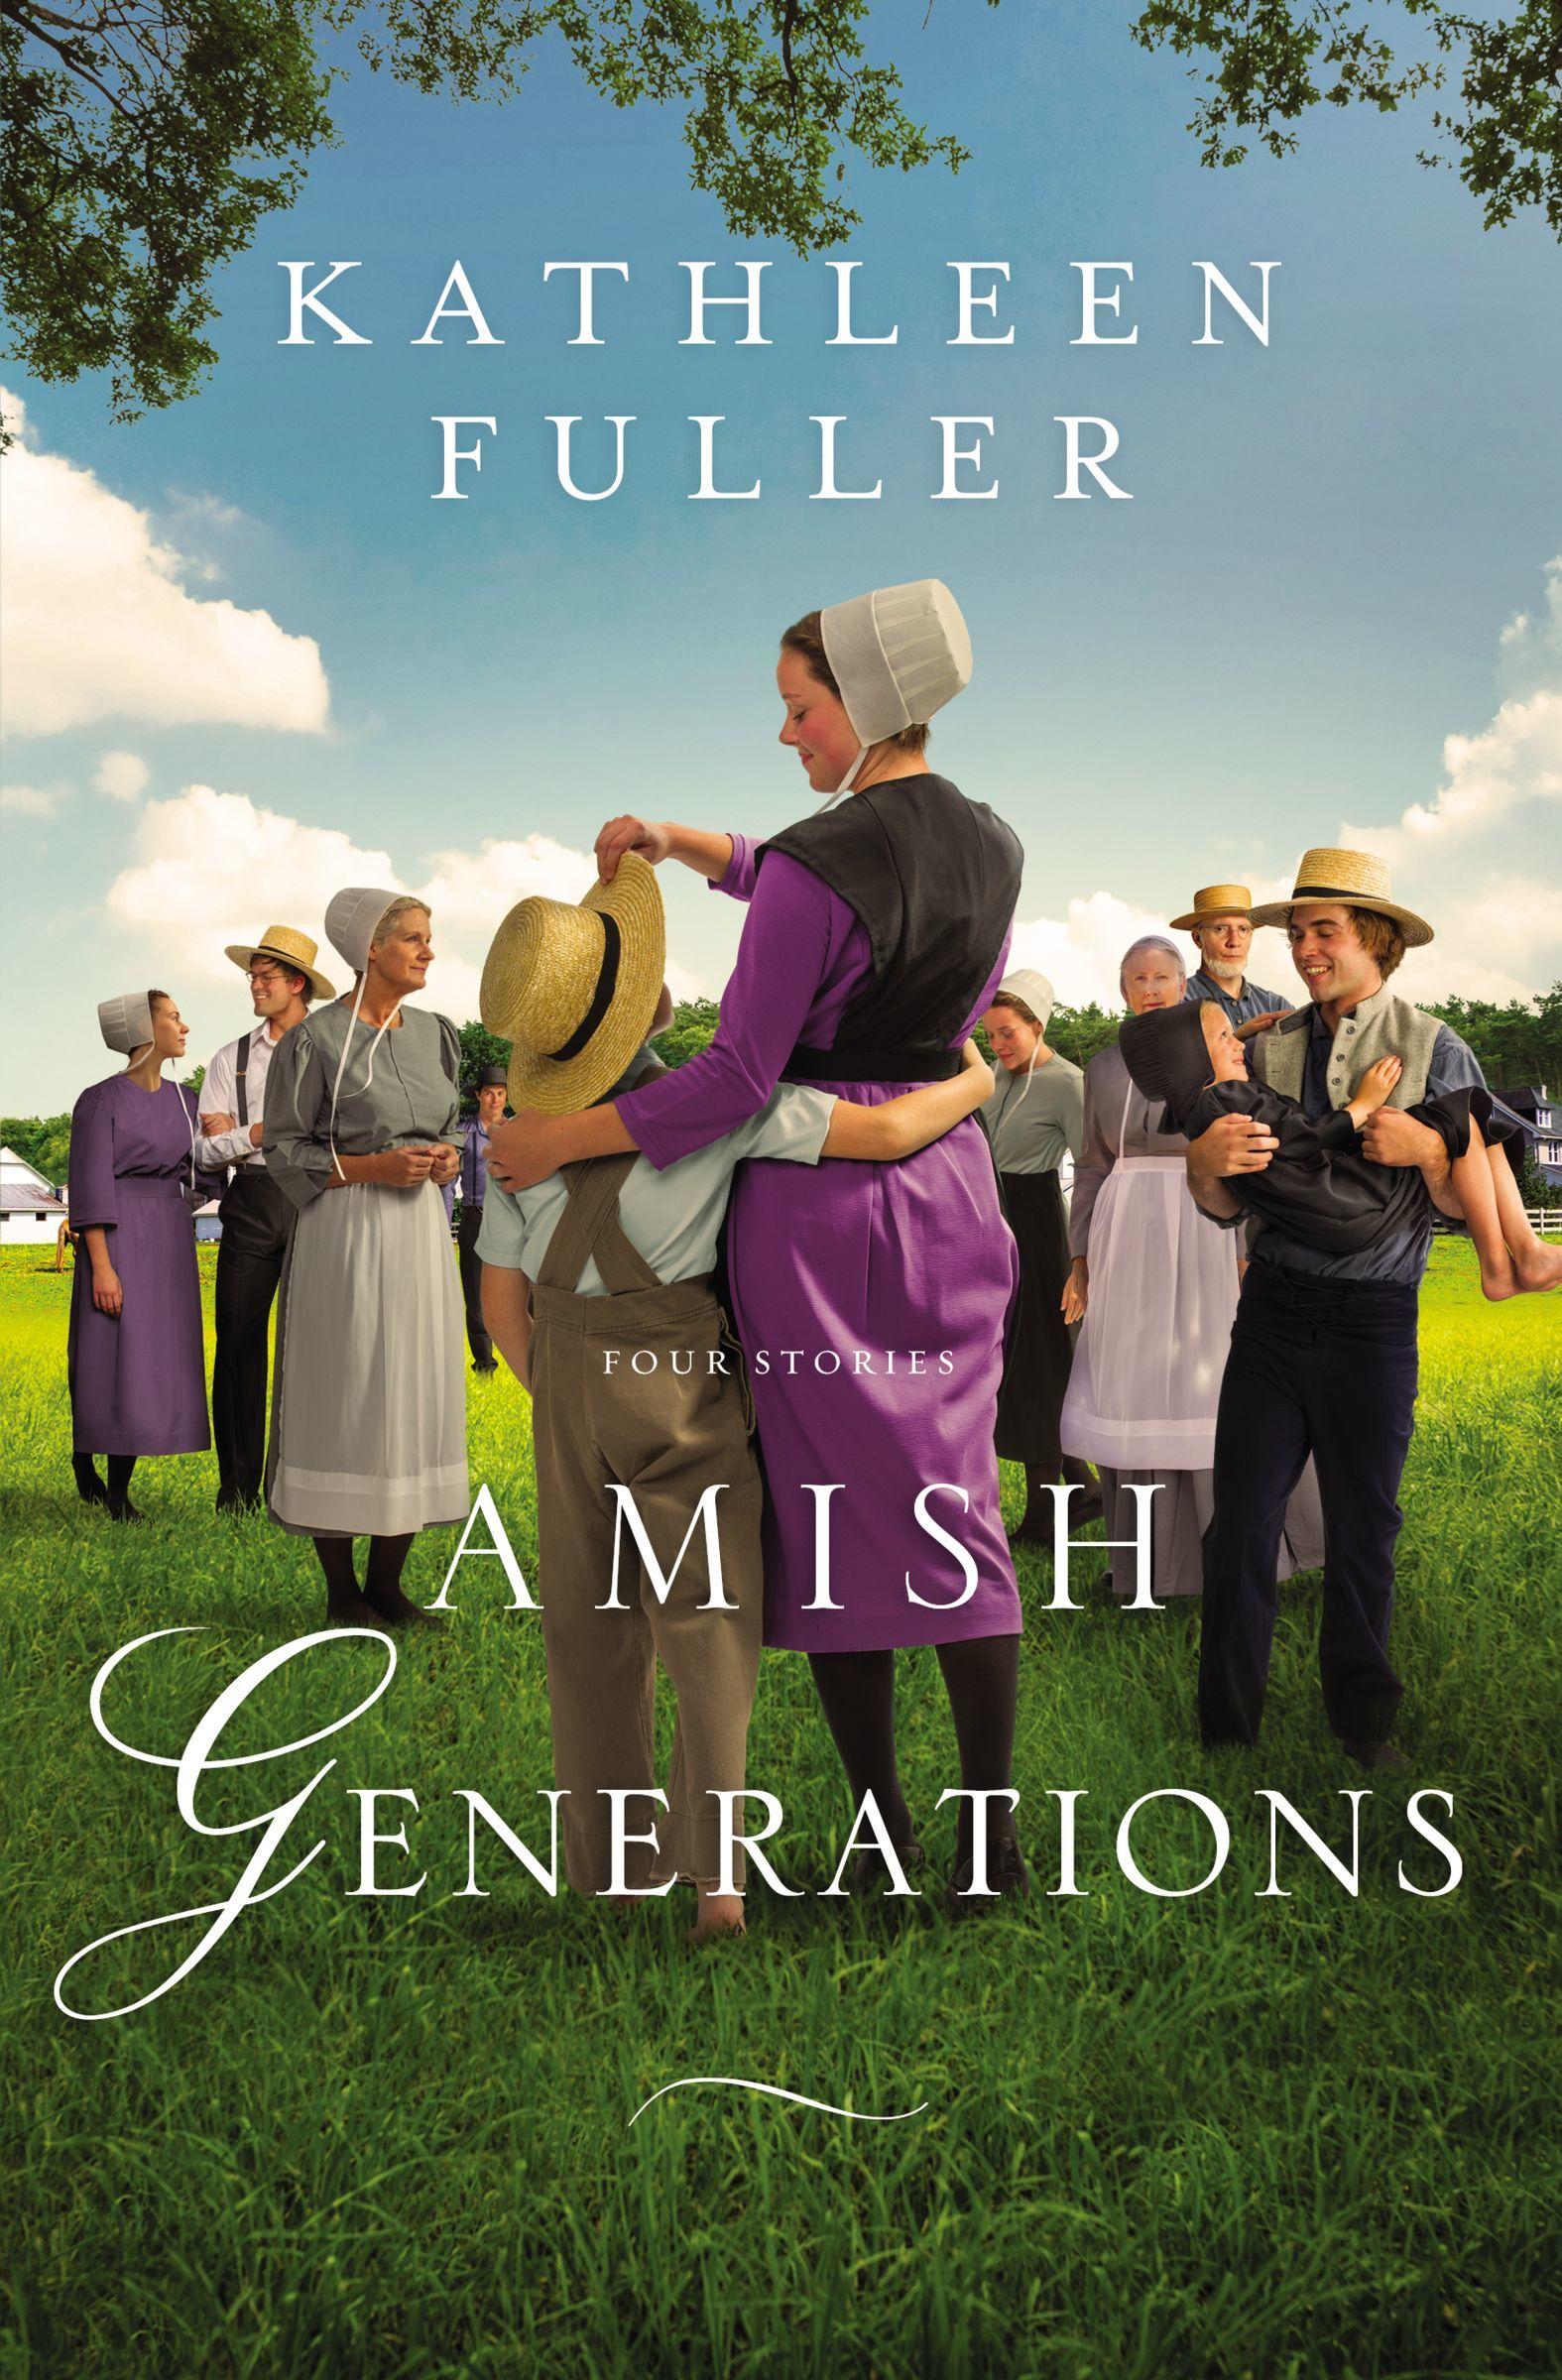 Amish Generation